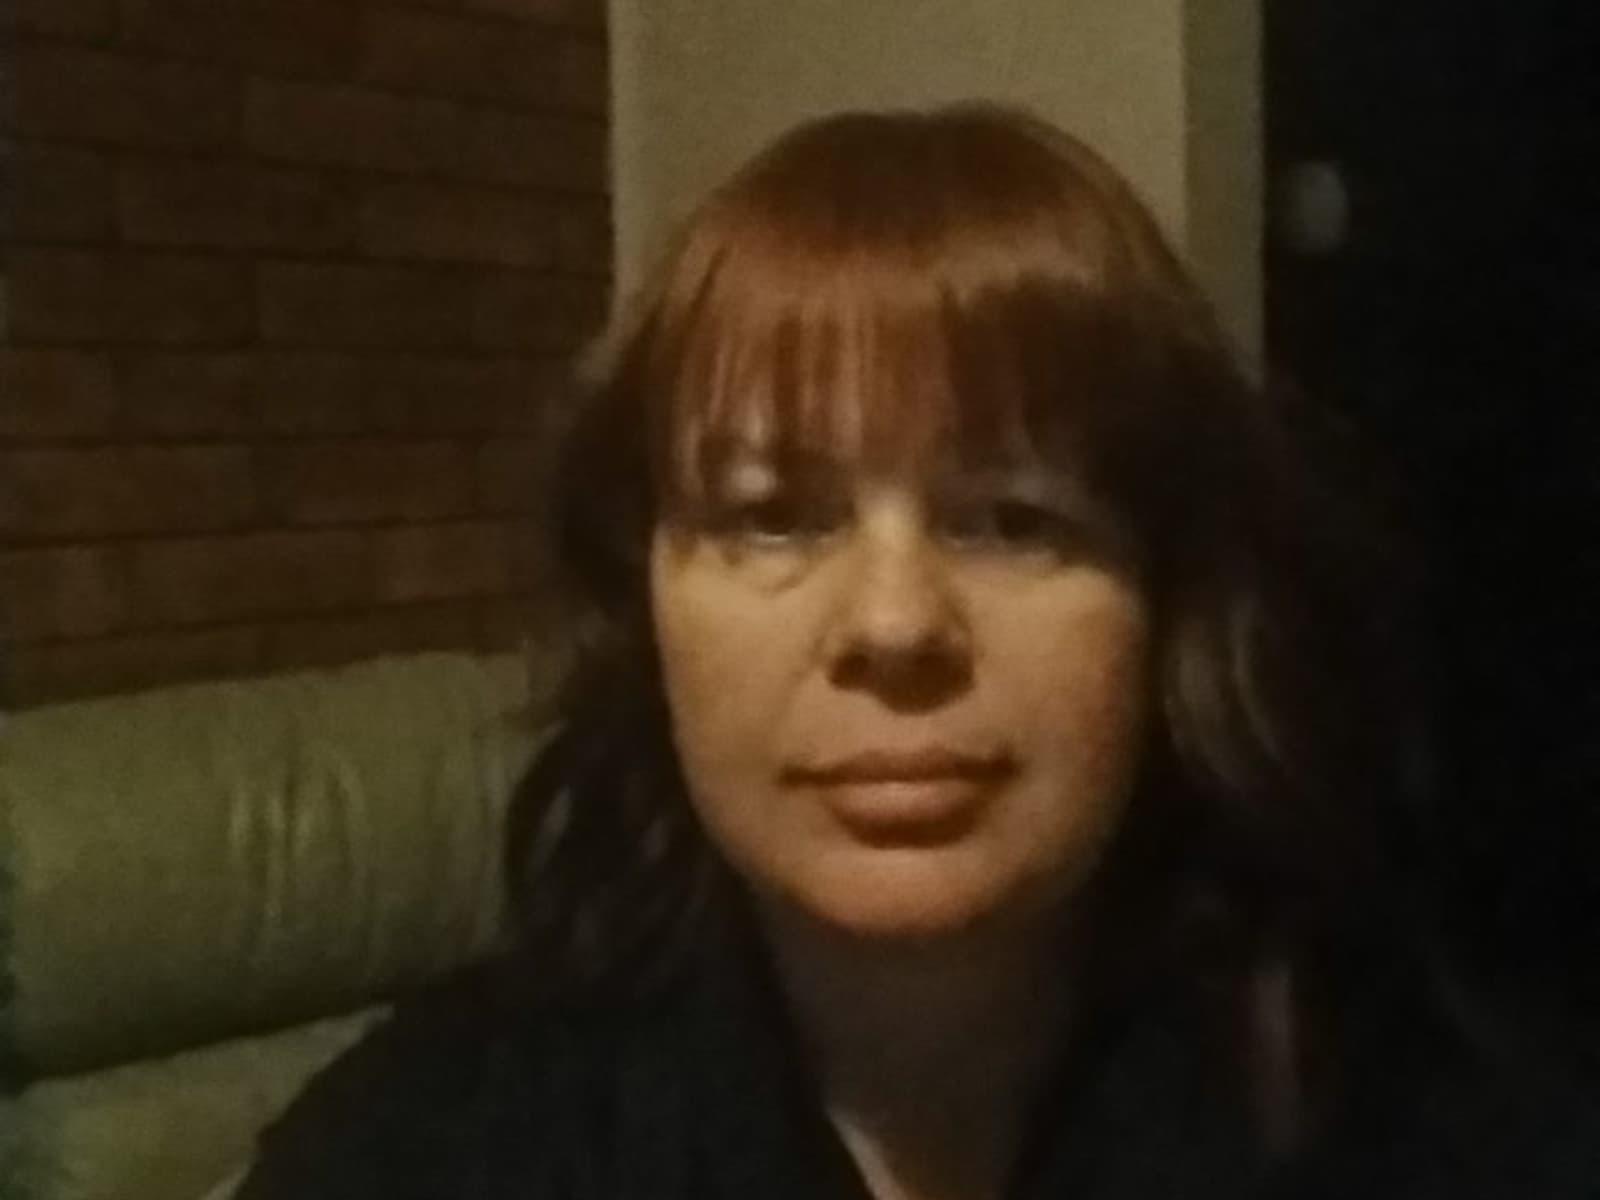 Erica from Bendigo, Victoria, Australia